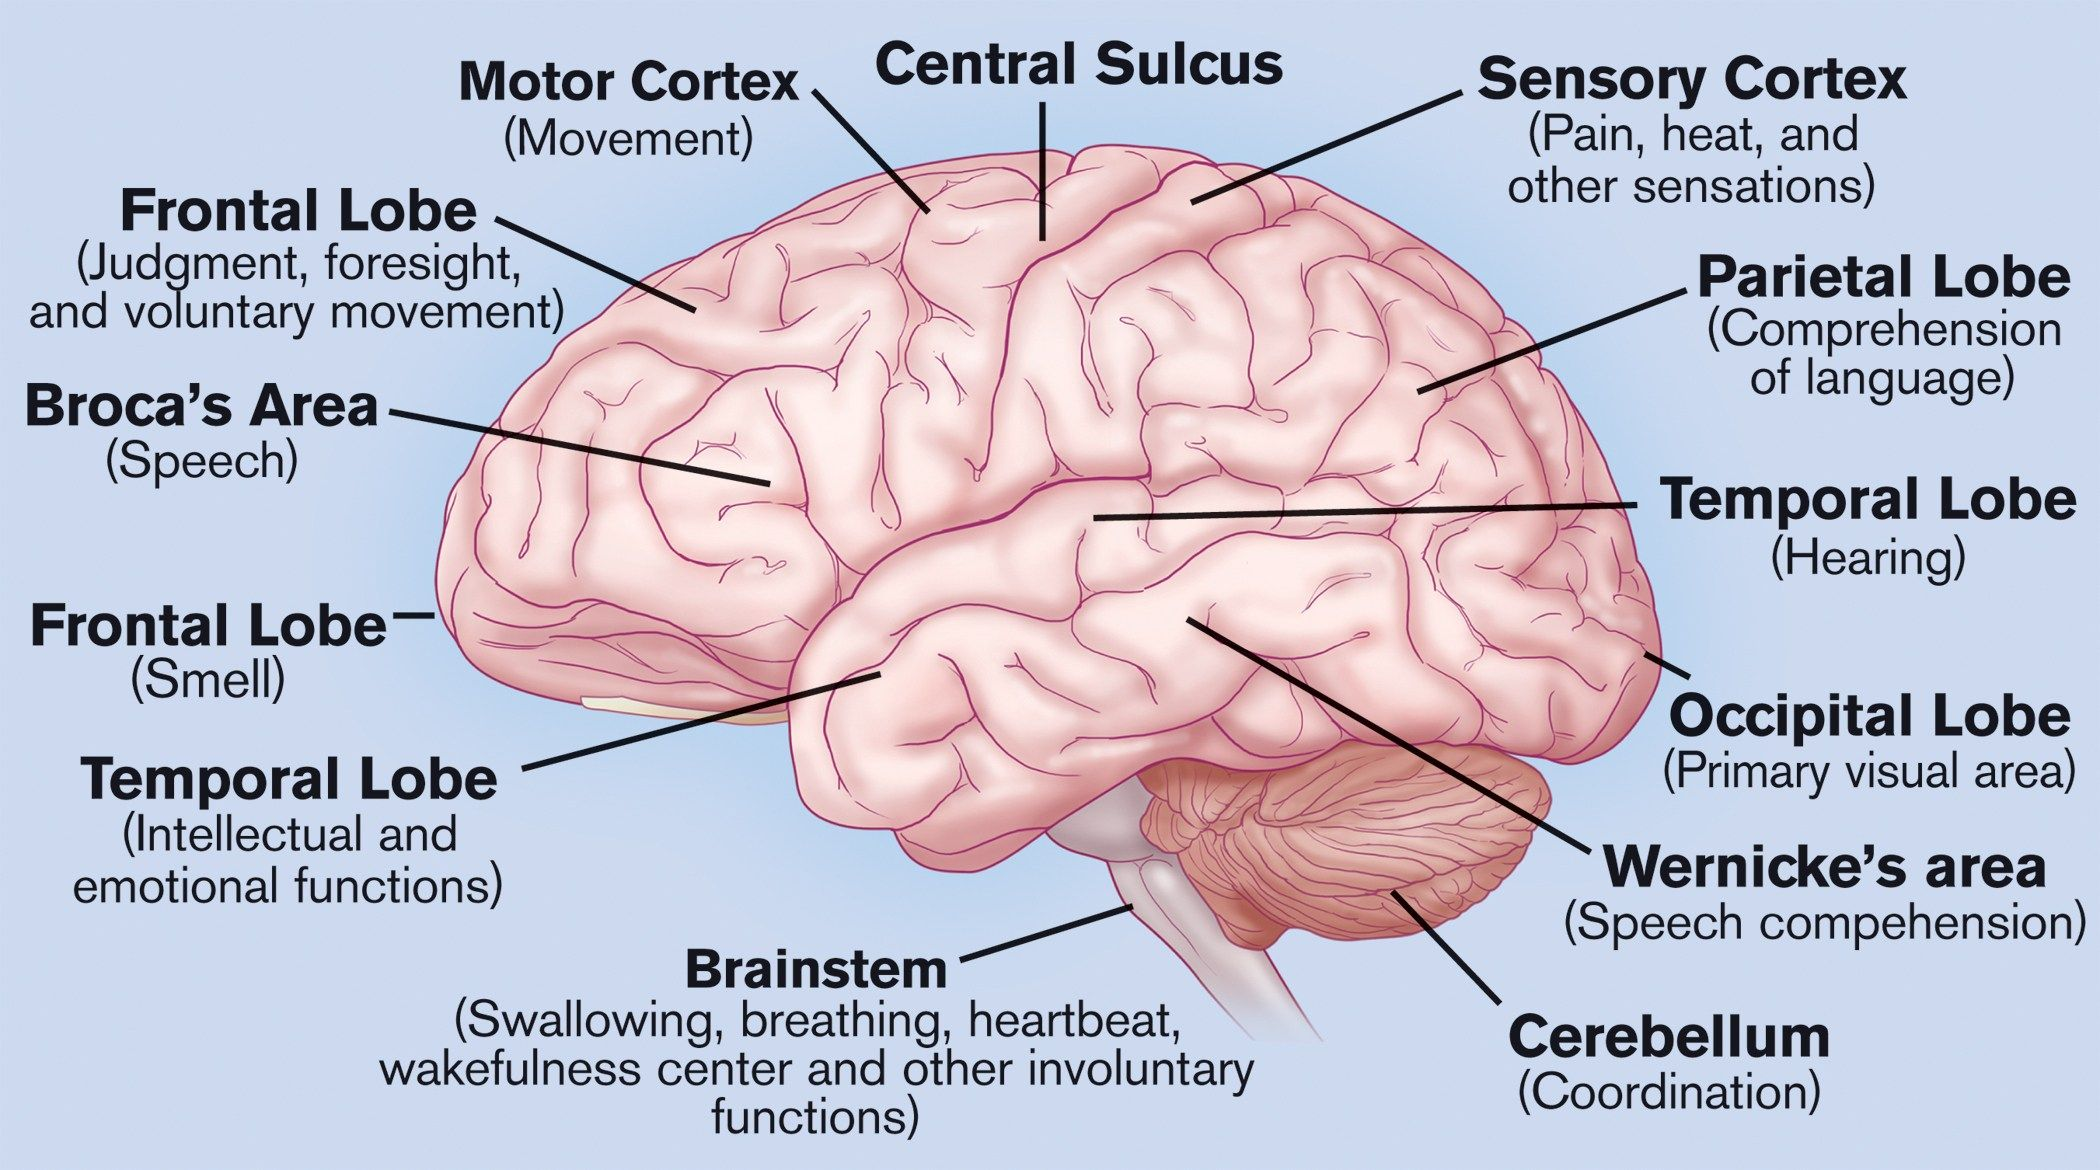 diagram of brain parts and functions diagram of brain parts and functions brainstructuresandtheirfunctions ganino [ 2100 x 1170 Pixel ]